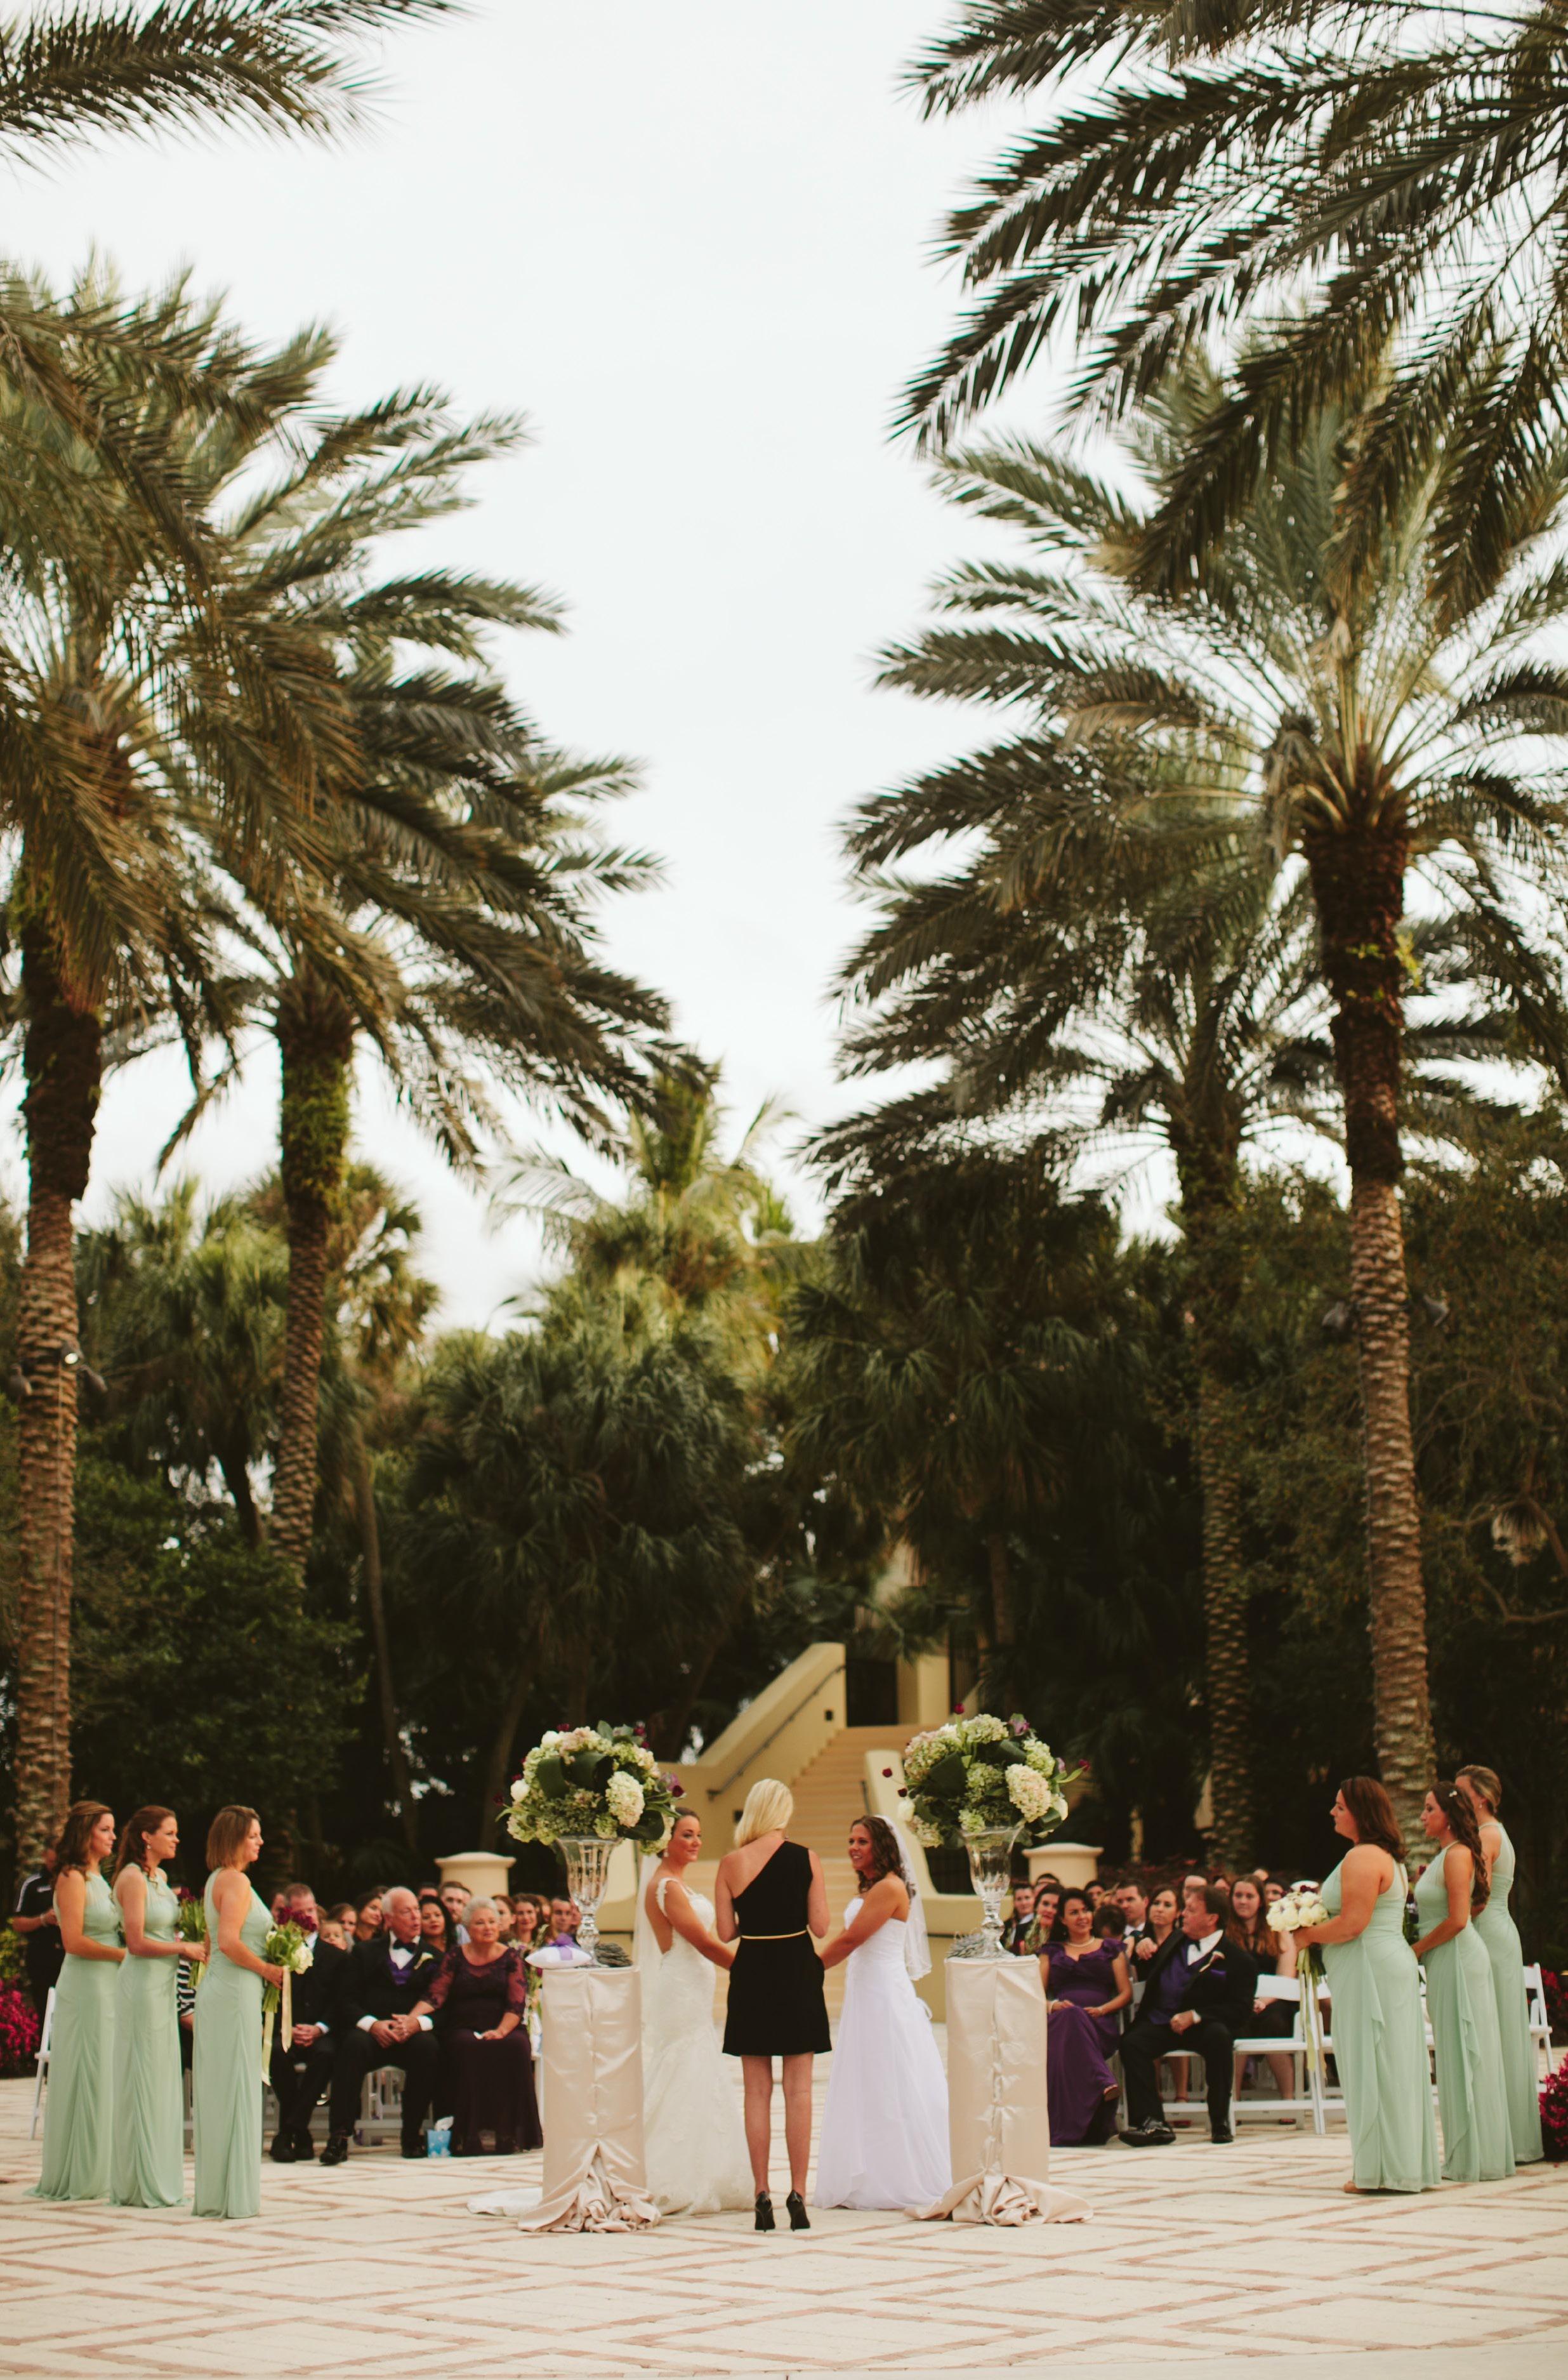 Kim + Monica's Mizner Country Club Wedding in Delray Beach56.jpg